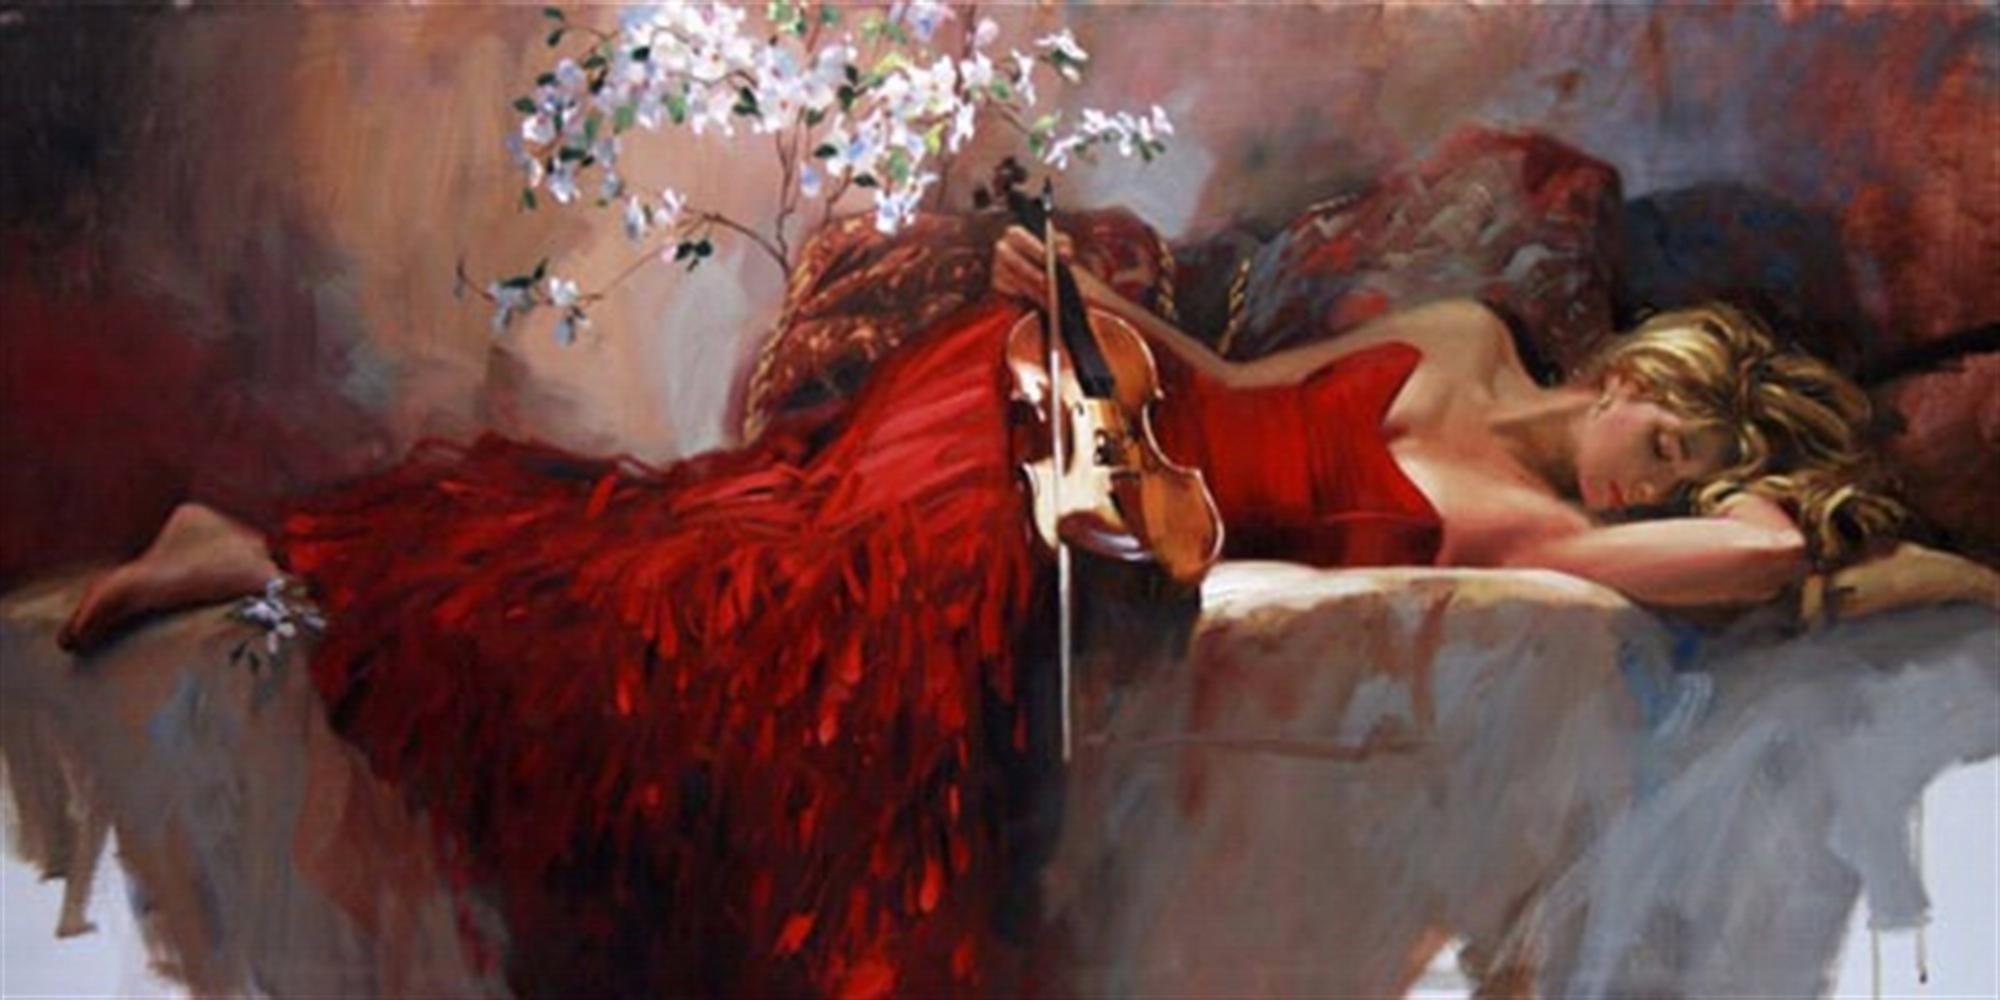 Twilight Muse by Richard Johnson